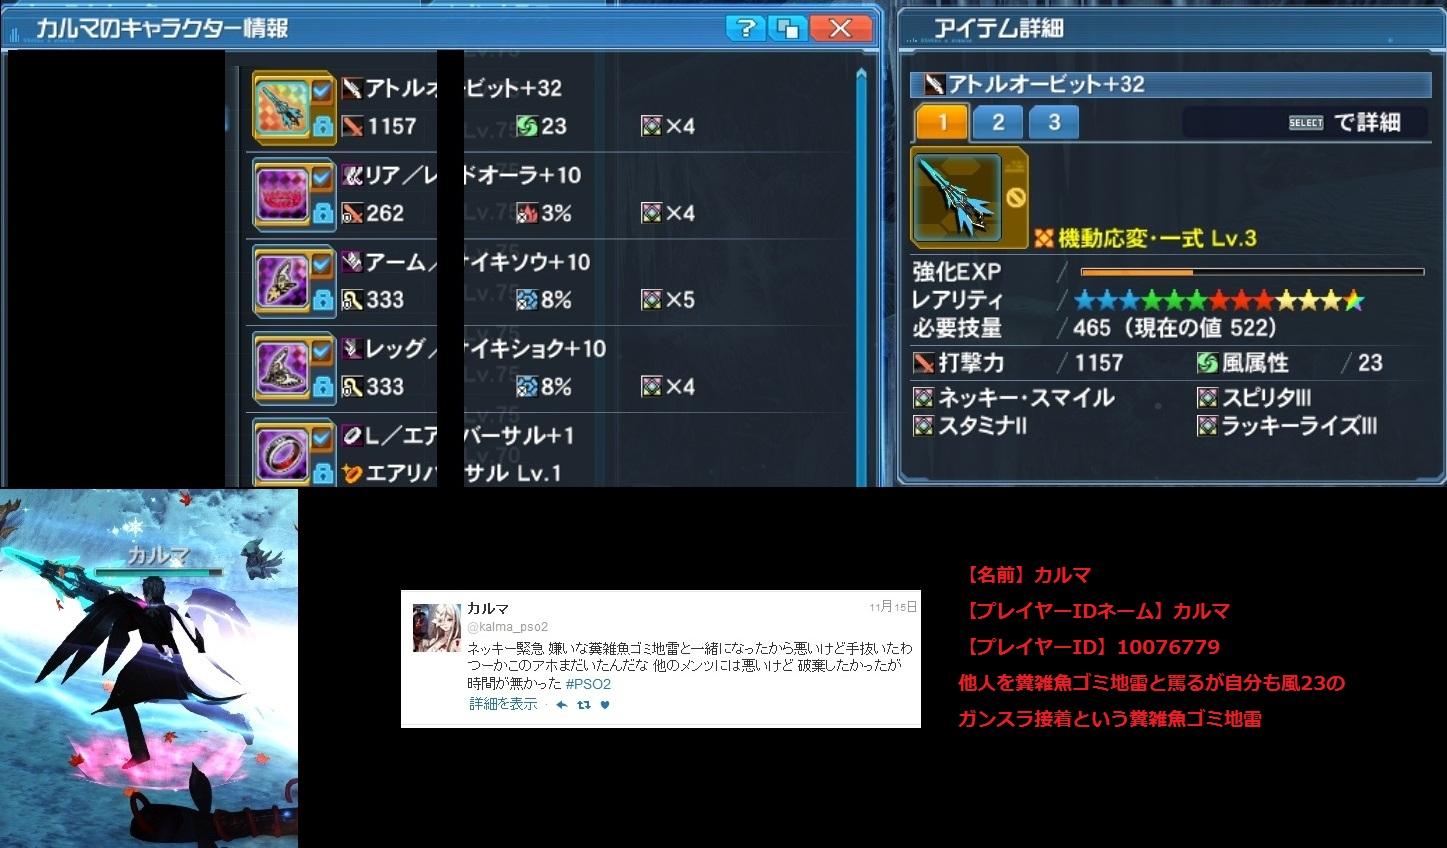 【PSO2】PHANTASY STAR ONLINE2 フェオ鯖晒しスレ119 [無断転載禁止]©2ch.netYouTube動画>2本 ->画像>159枚